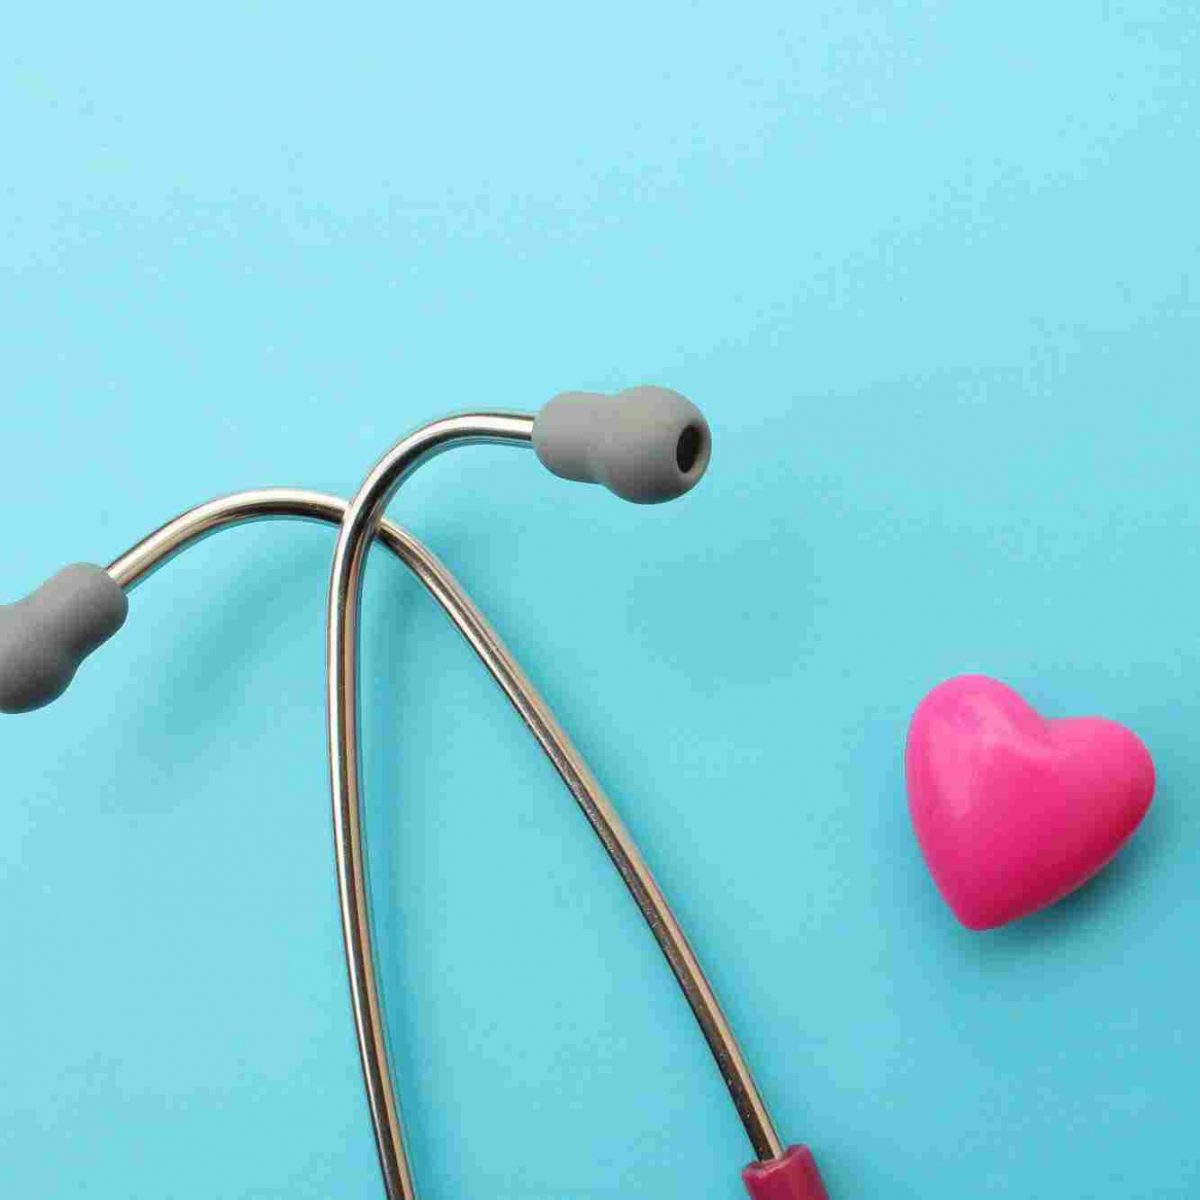 https://www.hakanbayraktar.com.tr/wp-content/uploads/2015/12/srce-i-stetoskop-1200x1200.jpg